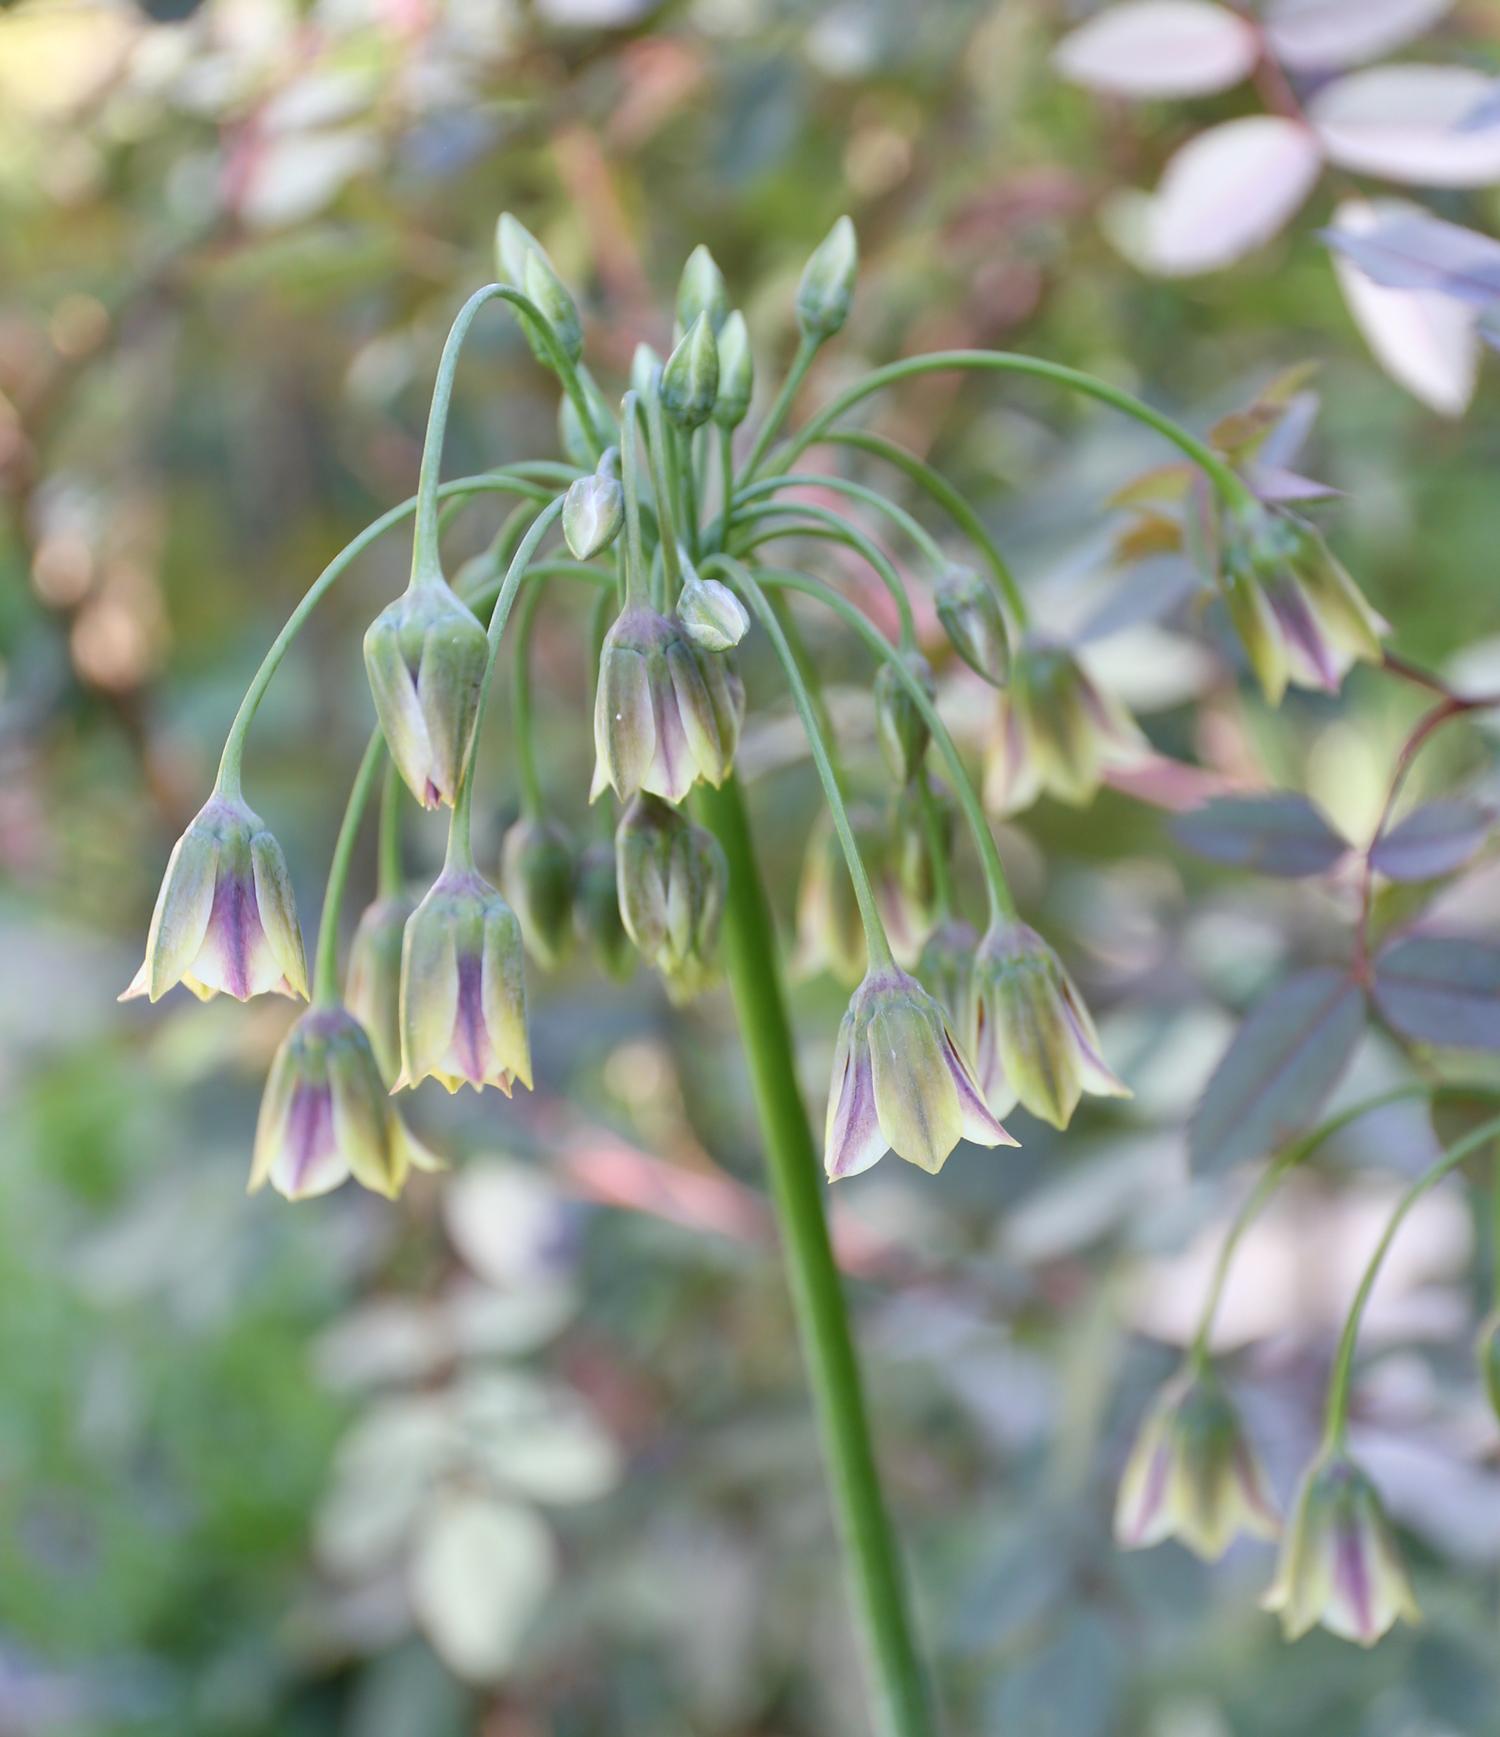 A Wonderful Allium by Any Name Sicilian Honey Garlic - Longfield Gardens